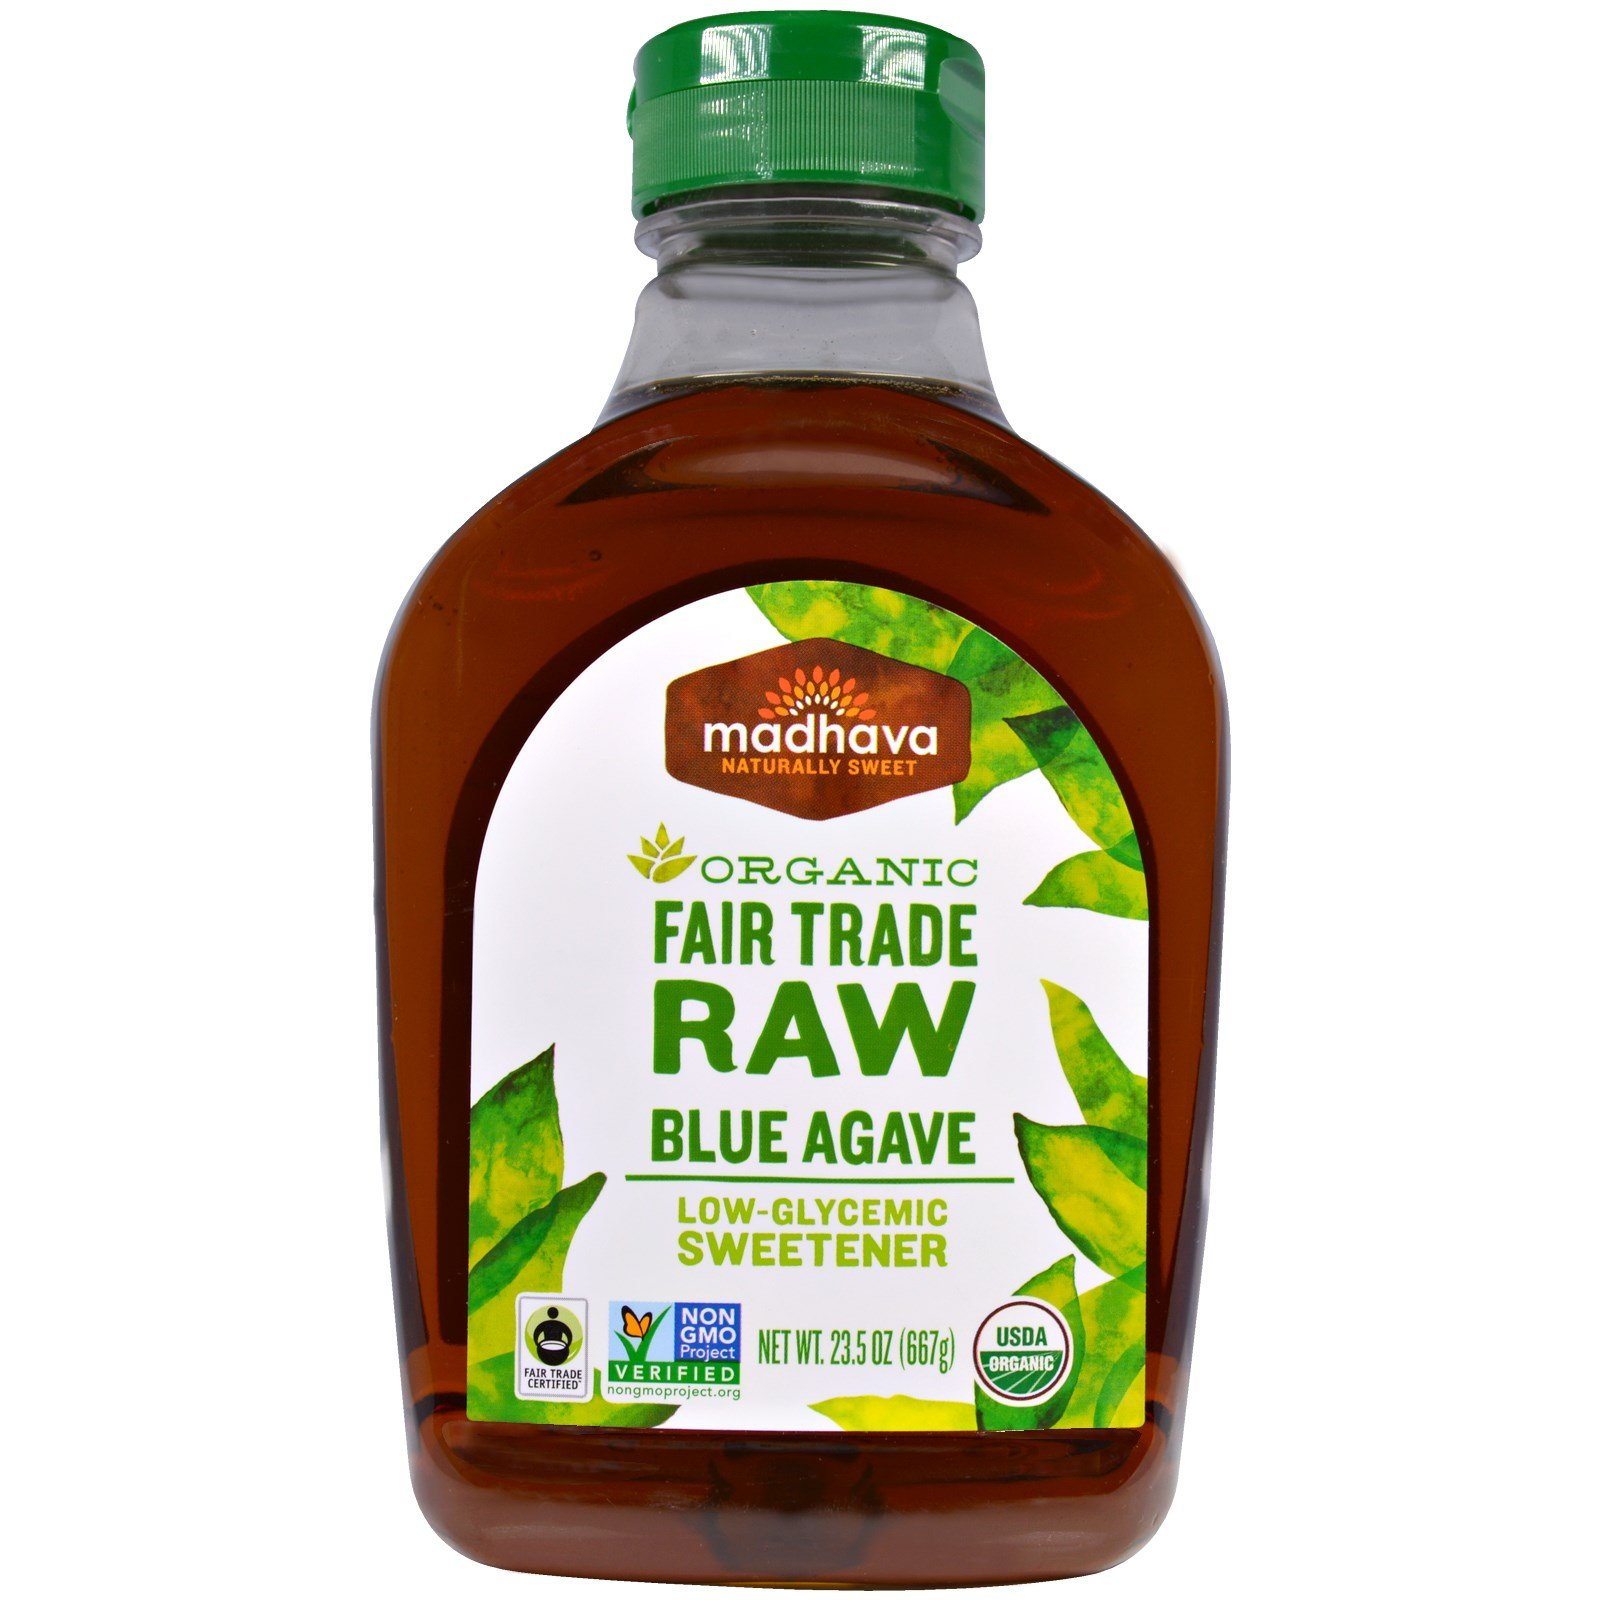 Madhava Natural Sweeteners, Organic Raw Agave Nectar, 23.5 oz (667 g) - 2pcs